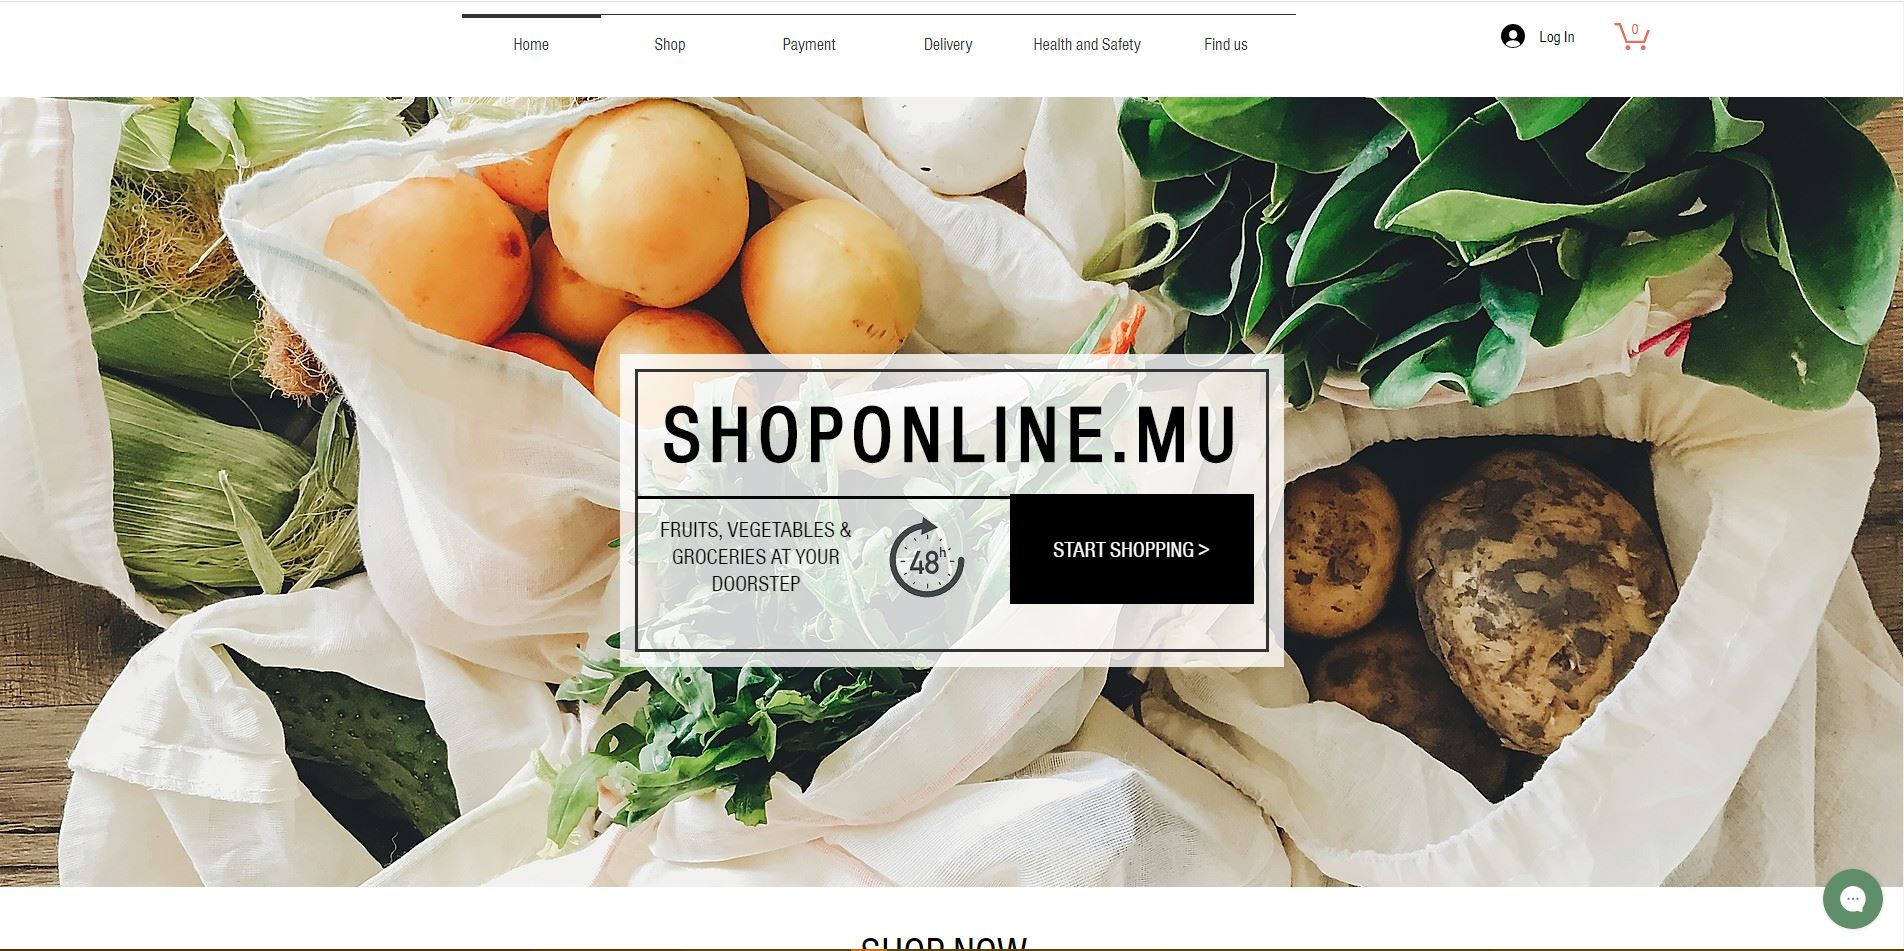 shoponline-mu-digital-marketing-mauritius-ecommerce